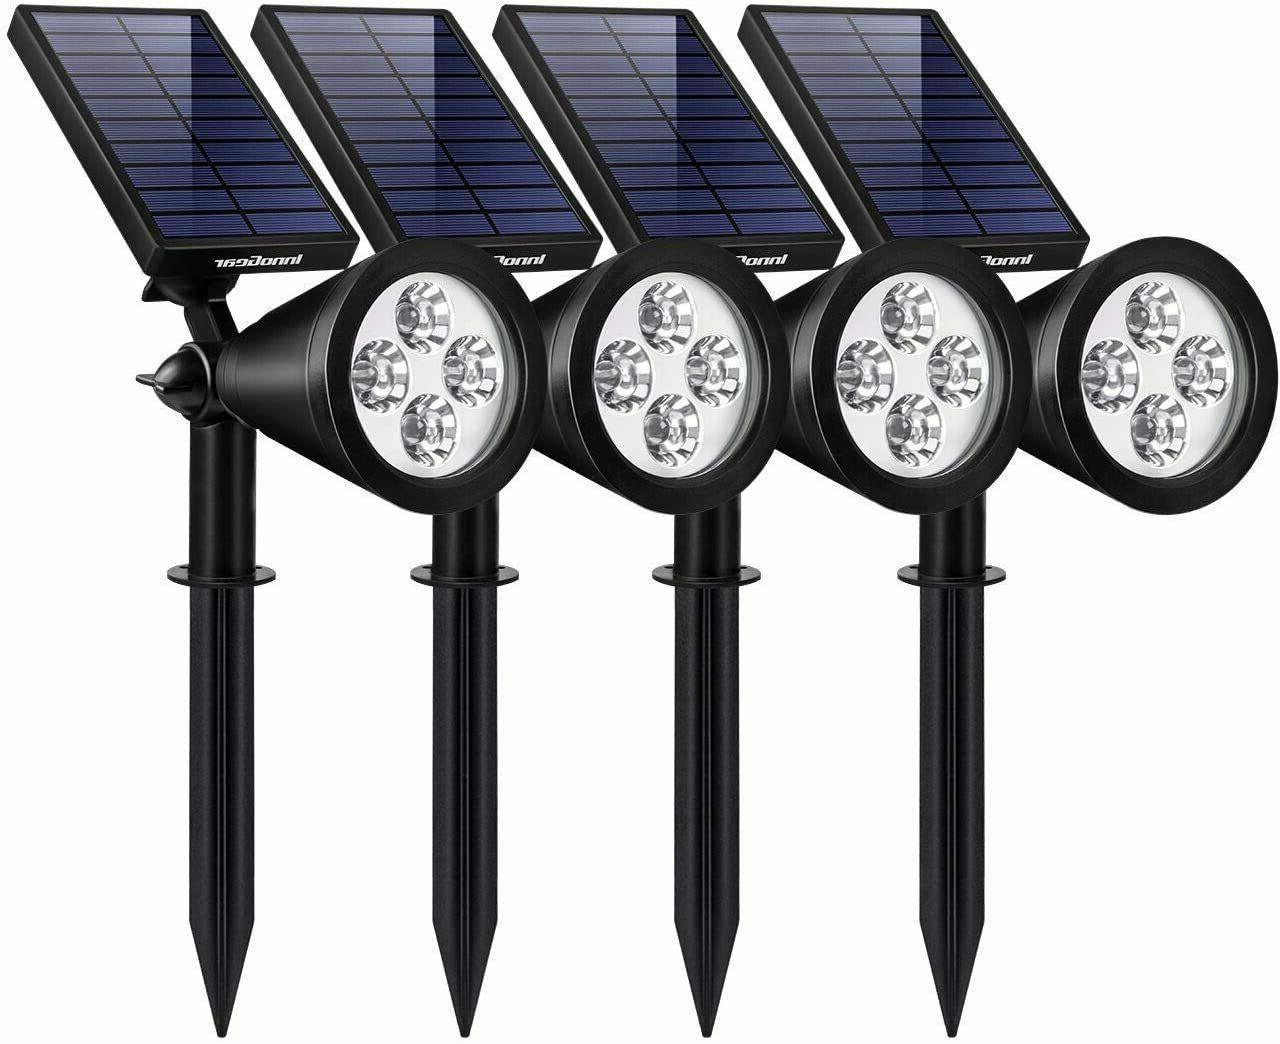 solar lights outdoor upgraded waterproof solar powered